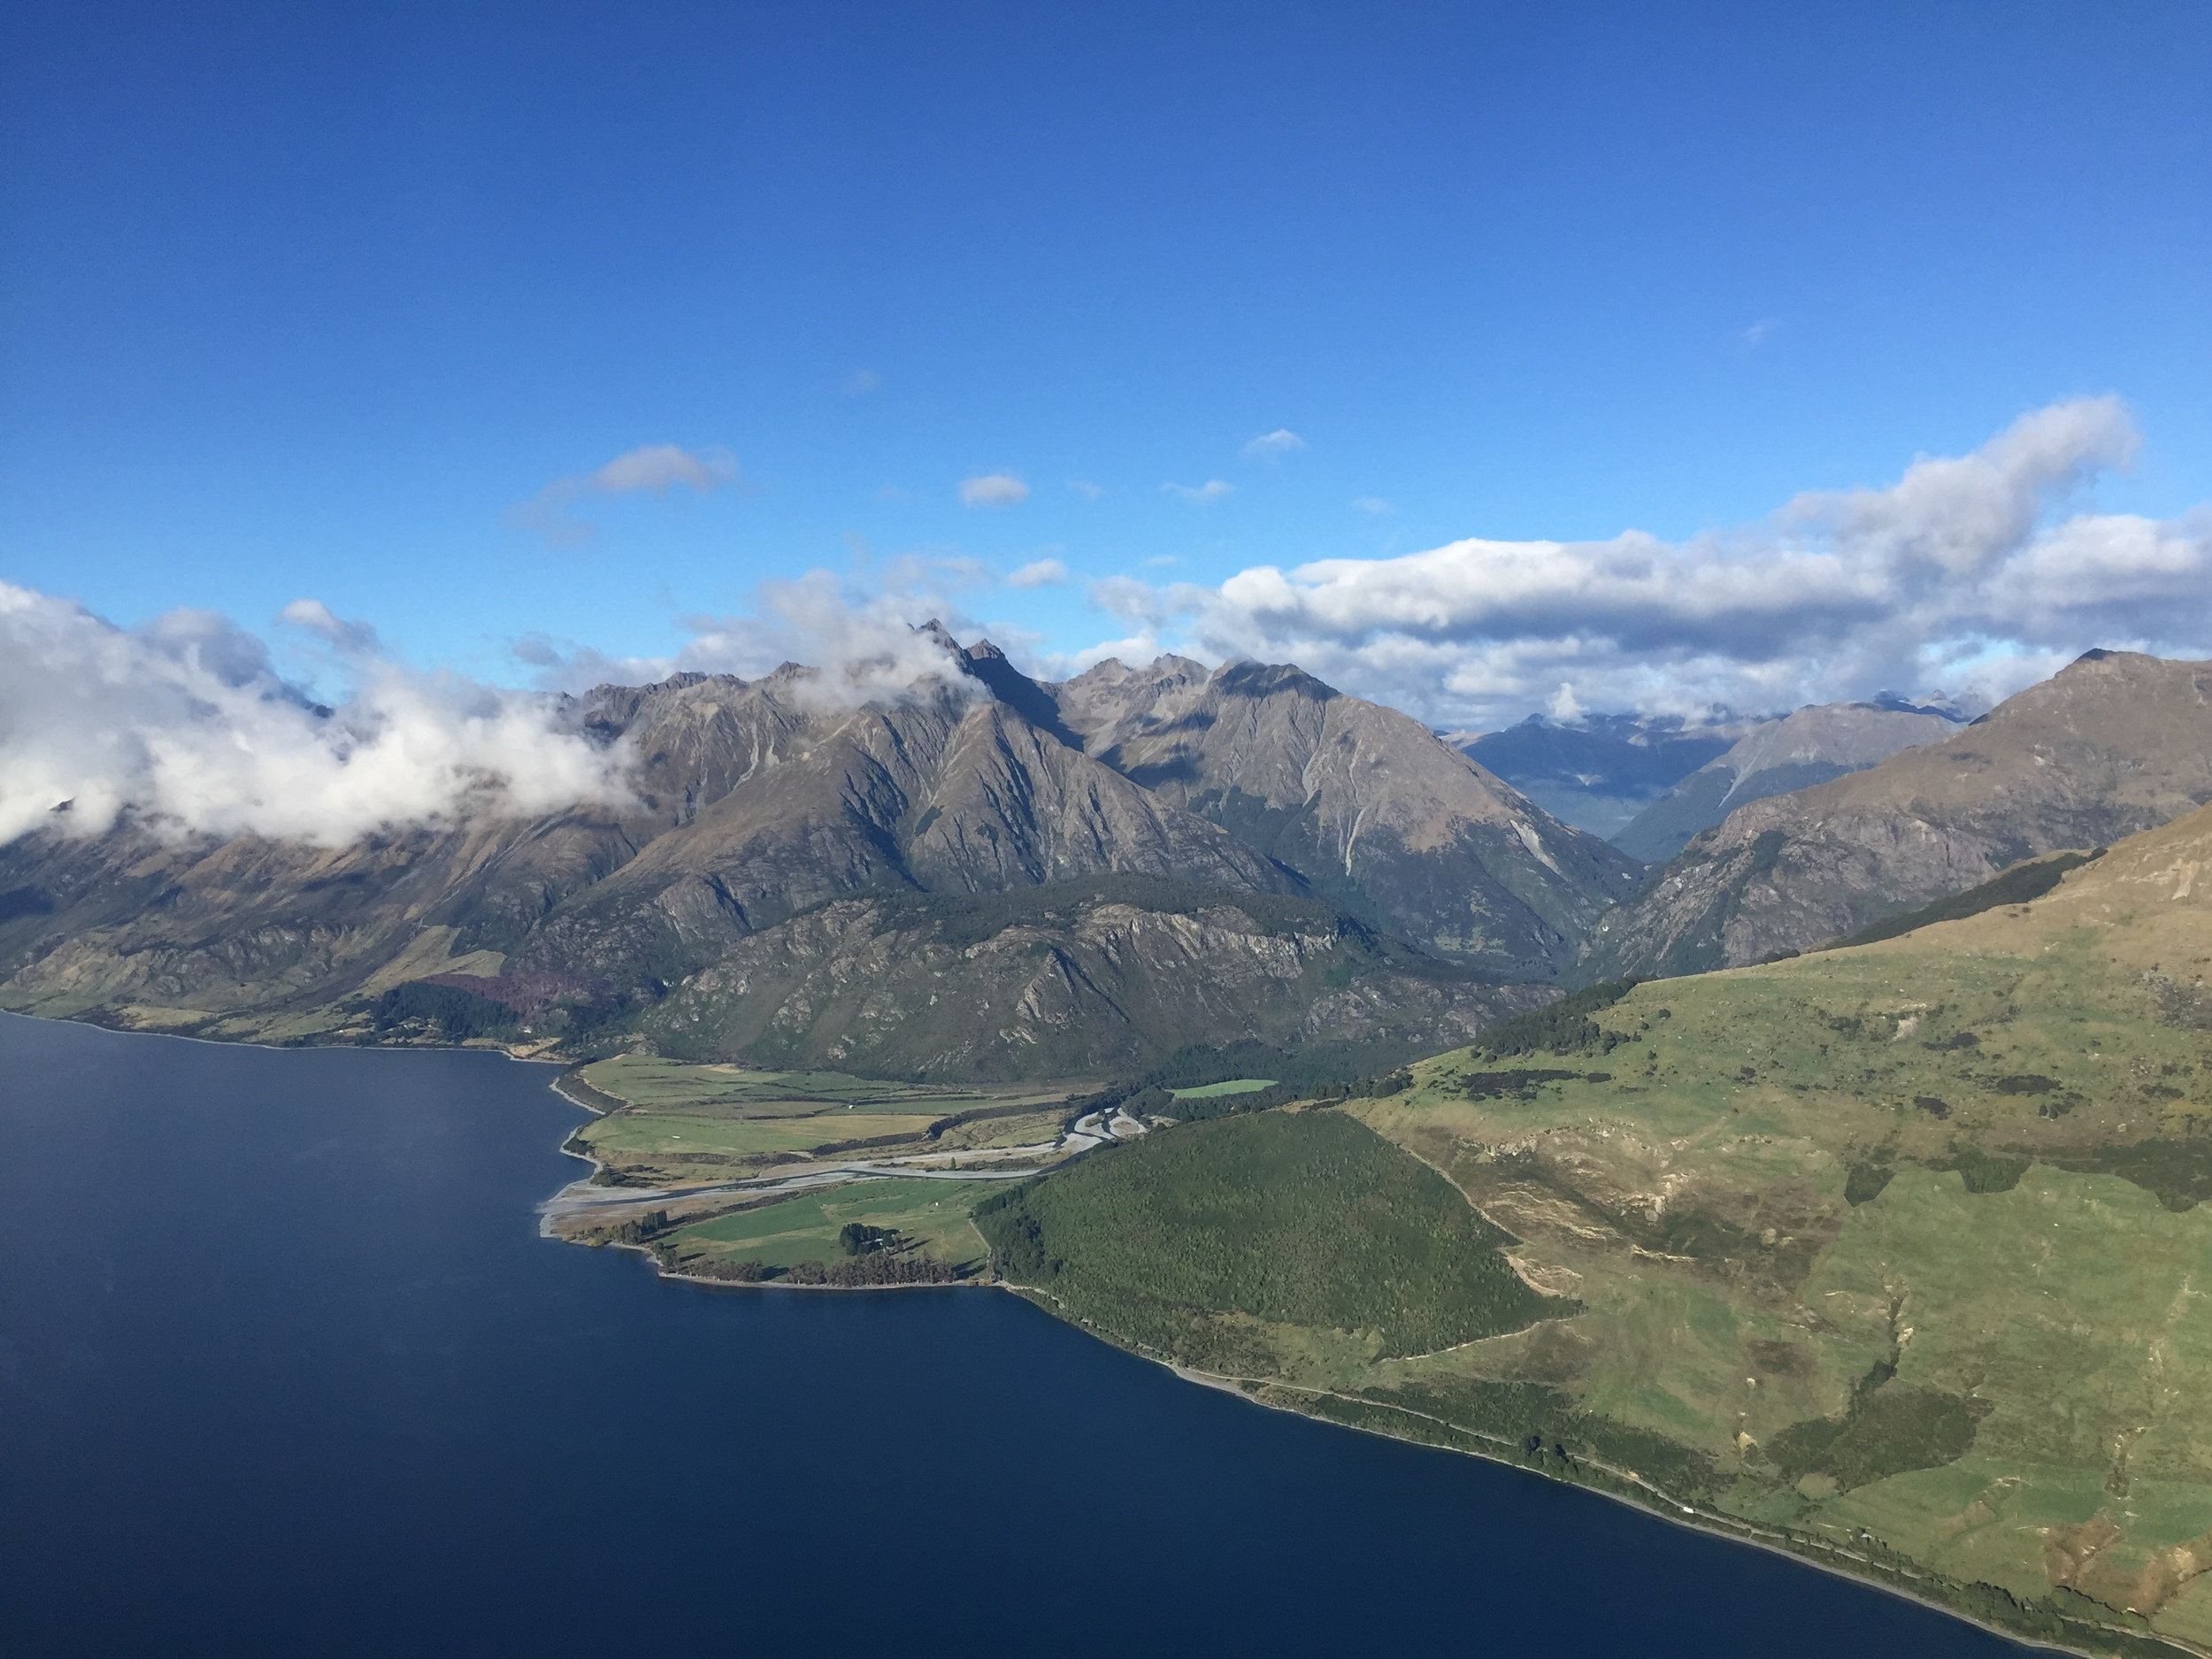 New Zealand, photo by Natalie Herbert